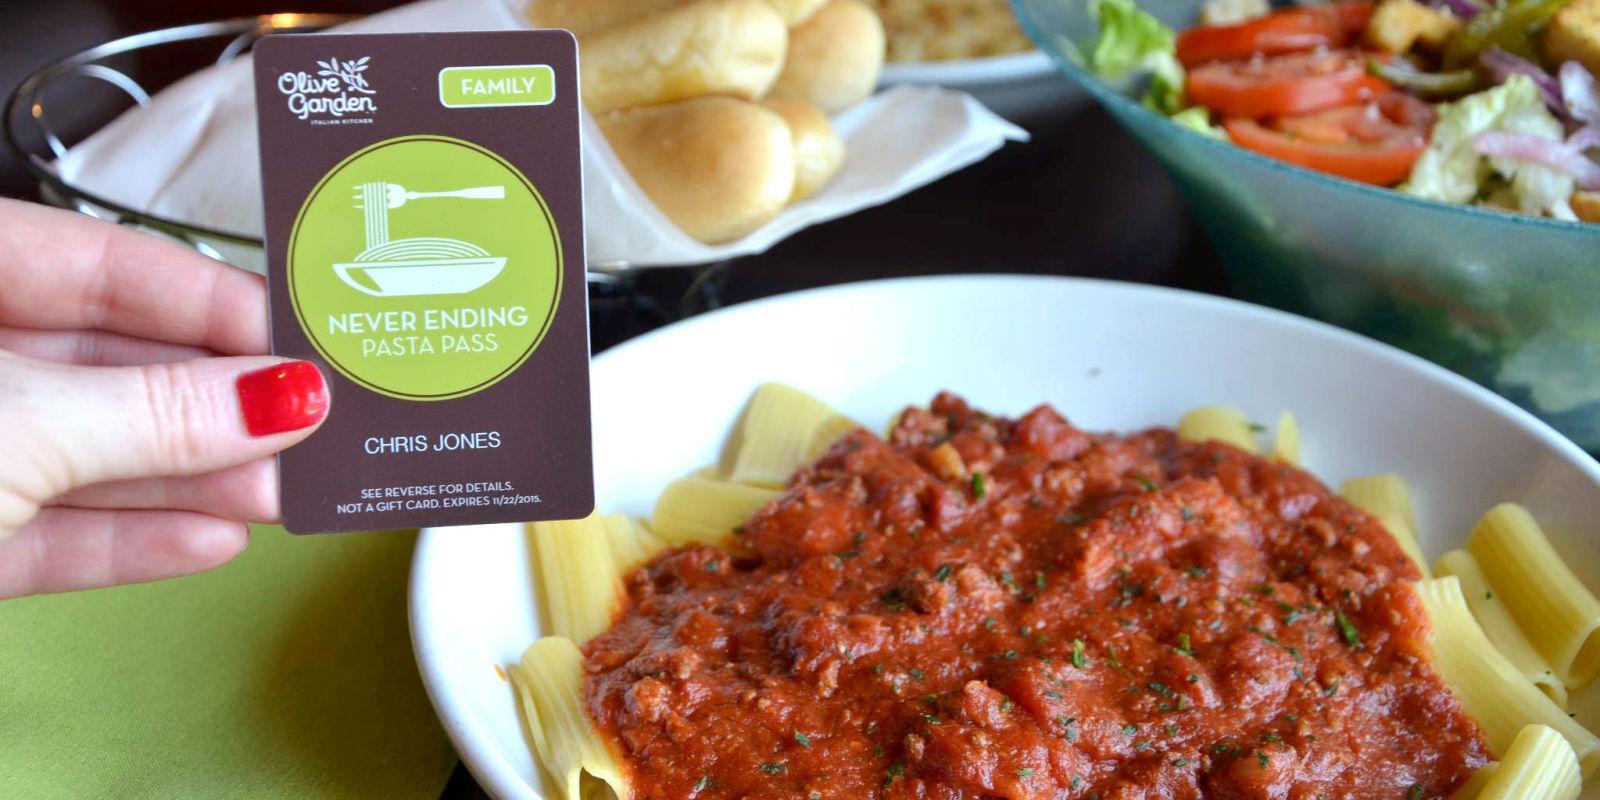 Menu For Olive Garden: Olive Garden's Never Ending Pasta Passes Are Going For